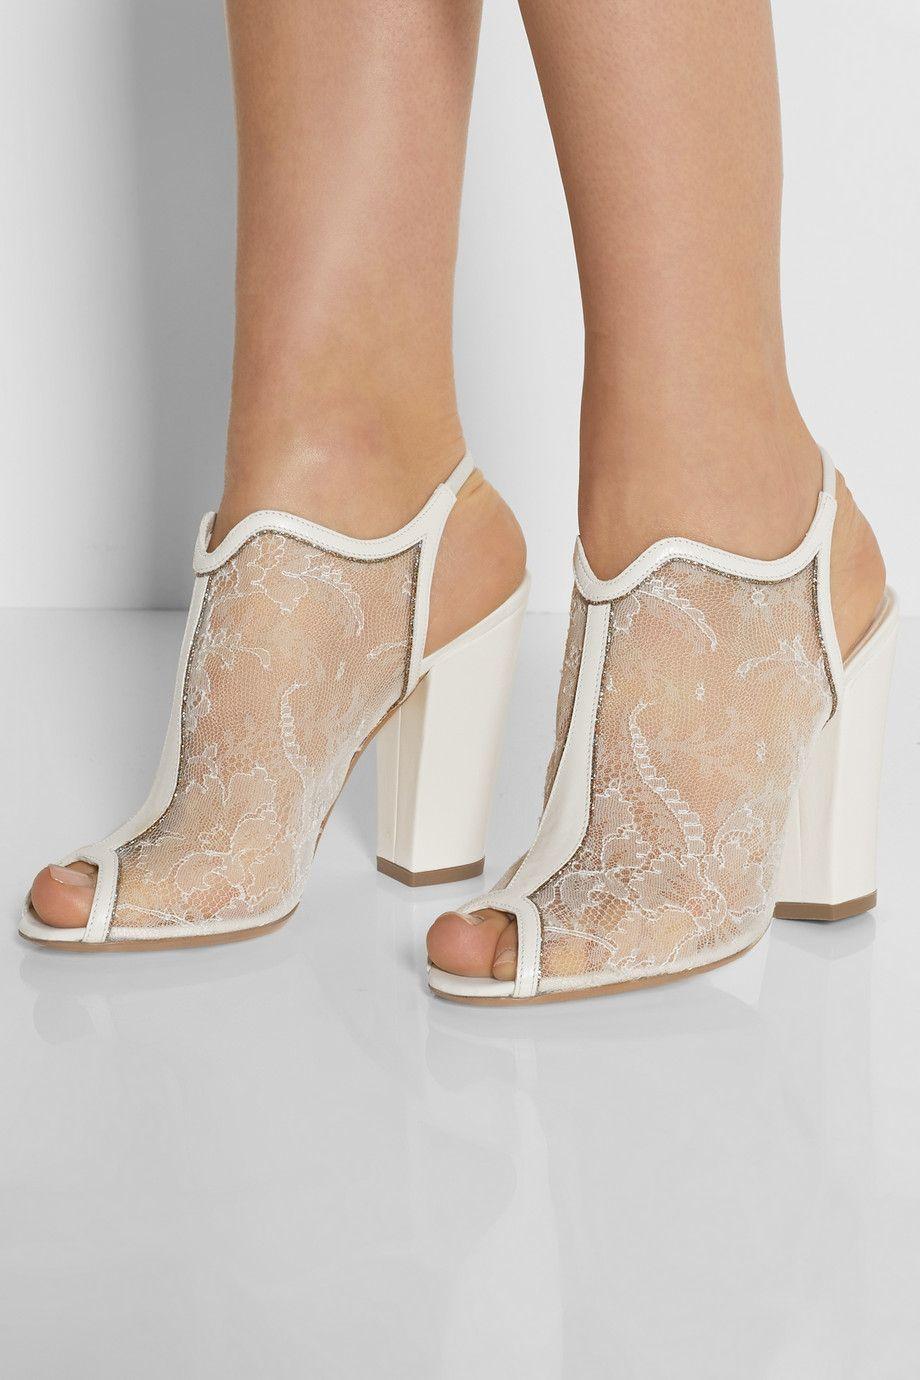 Nicholas kirkwood leather and glittertrimmed lace sandals neta